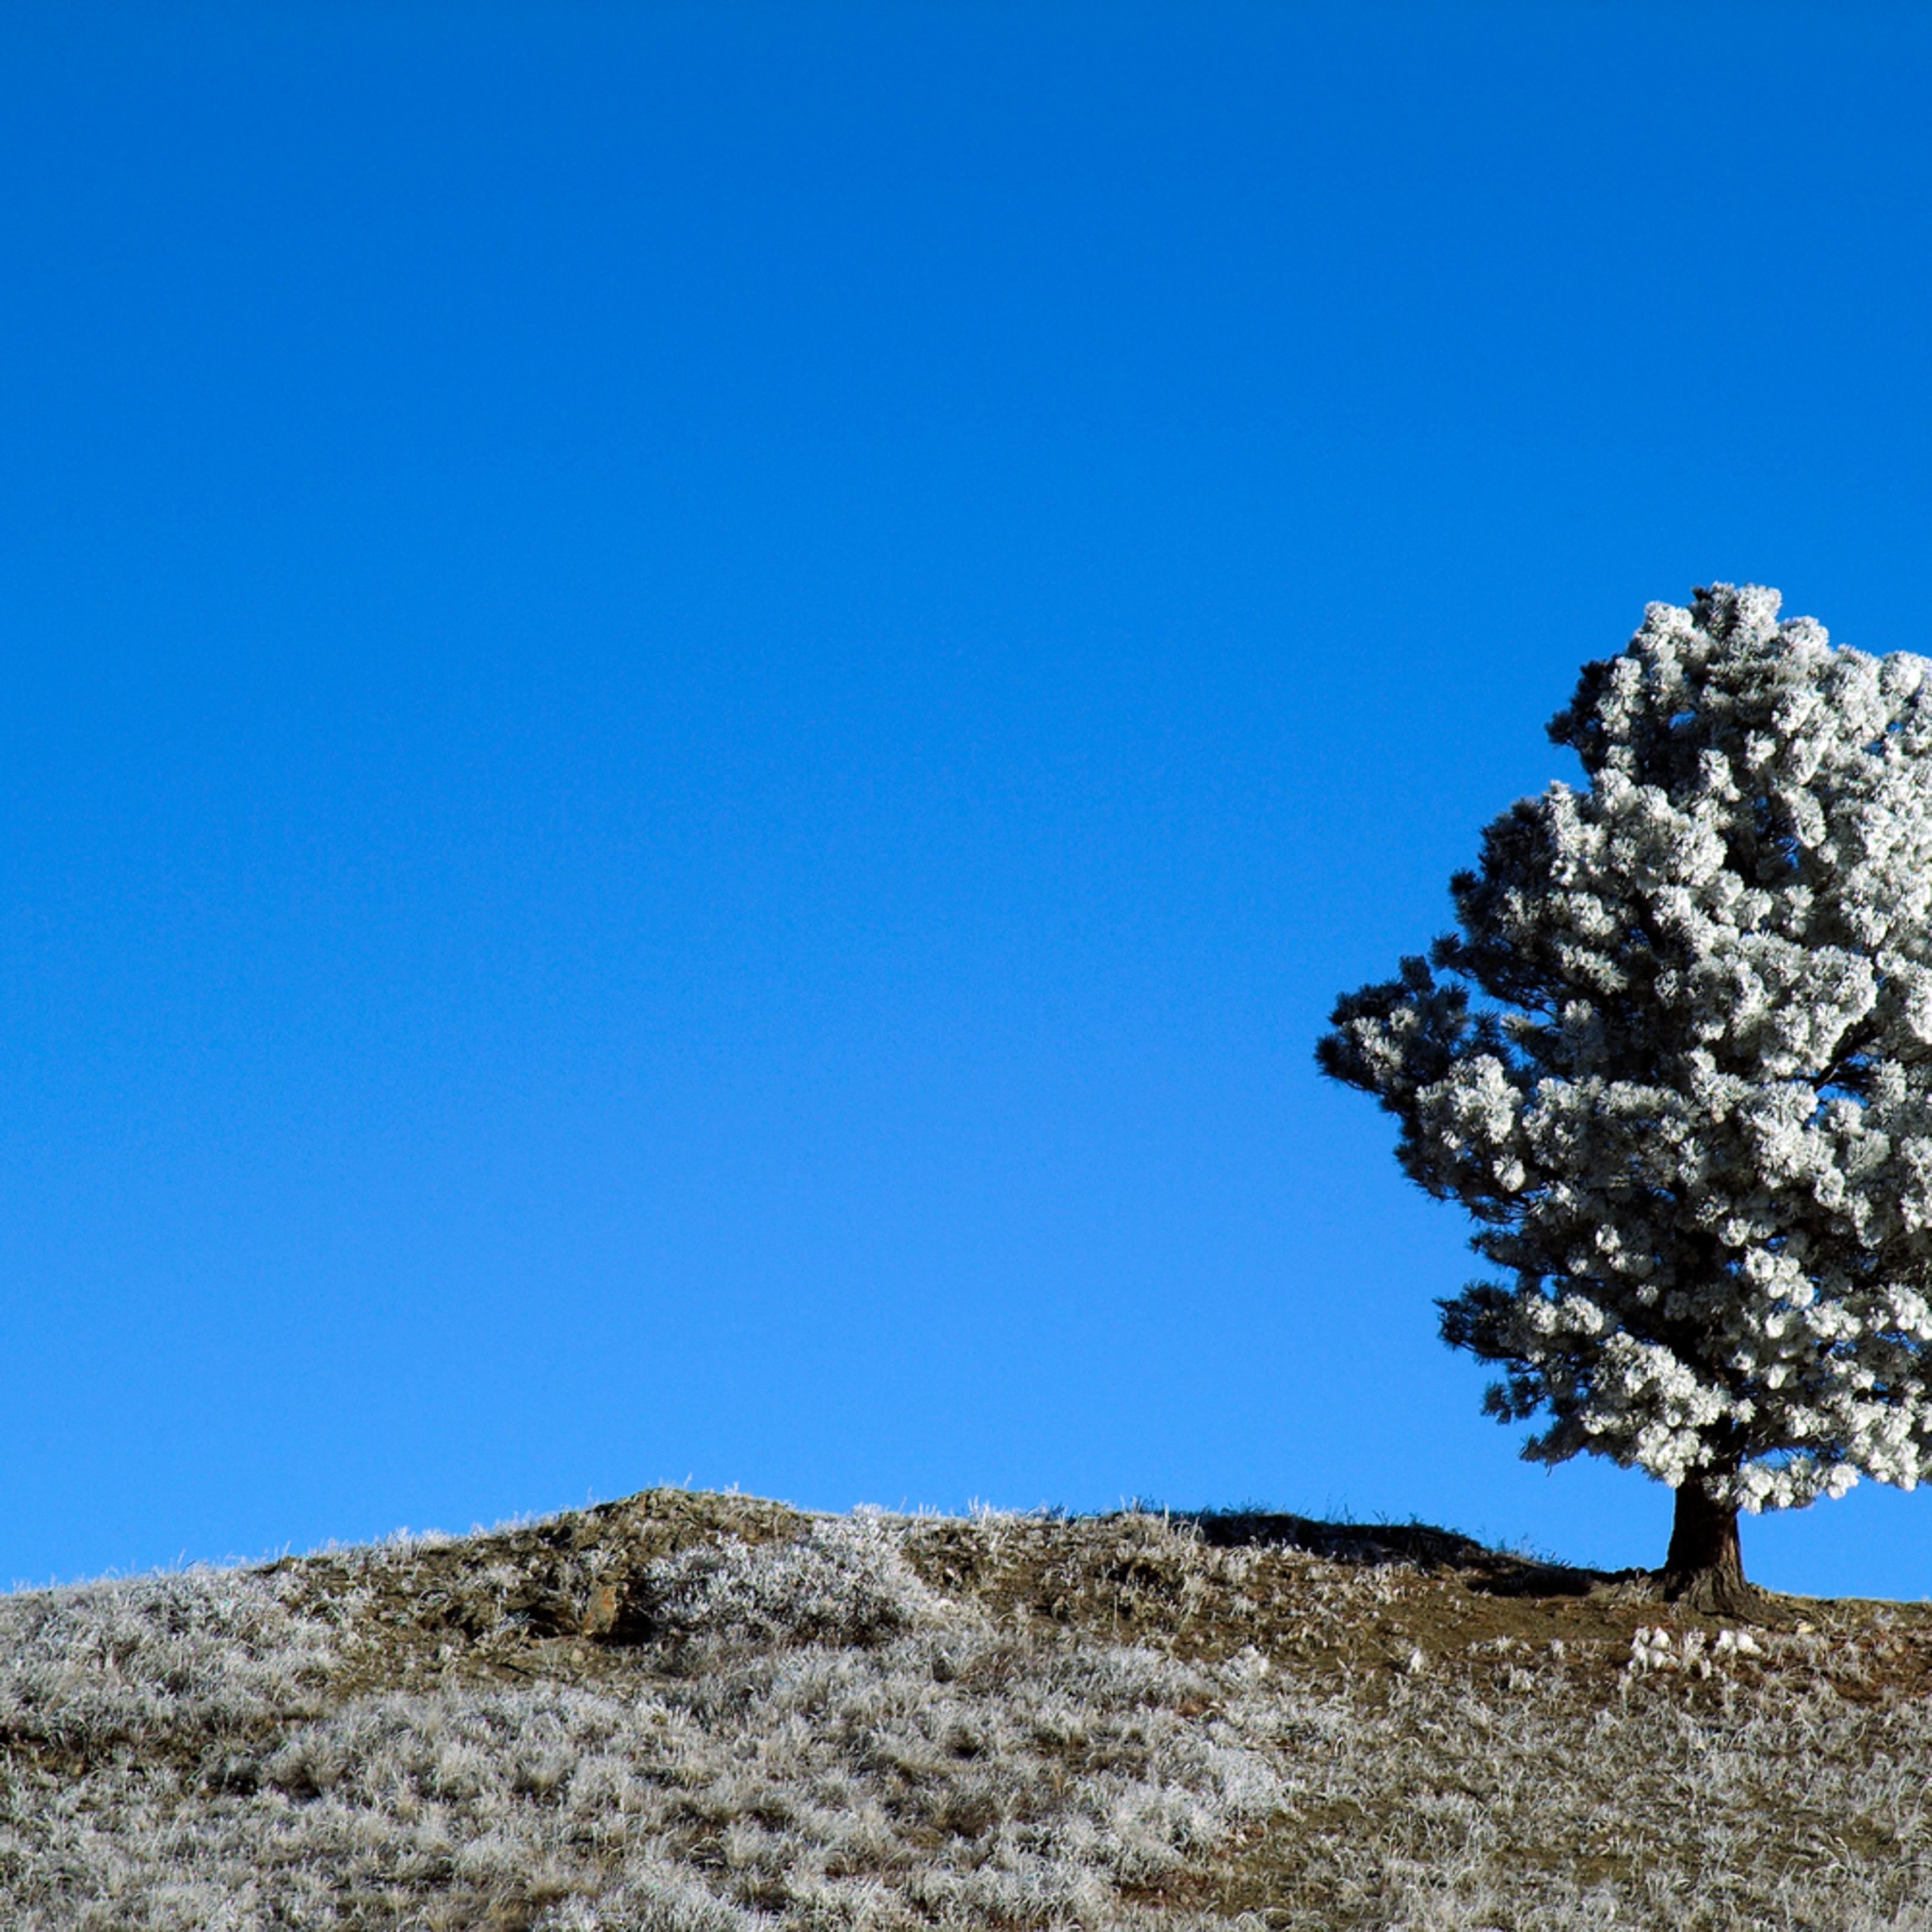 Lone tree cjuib2